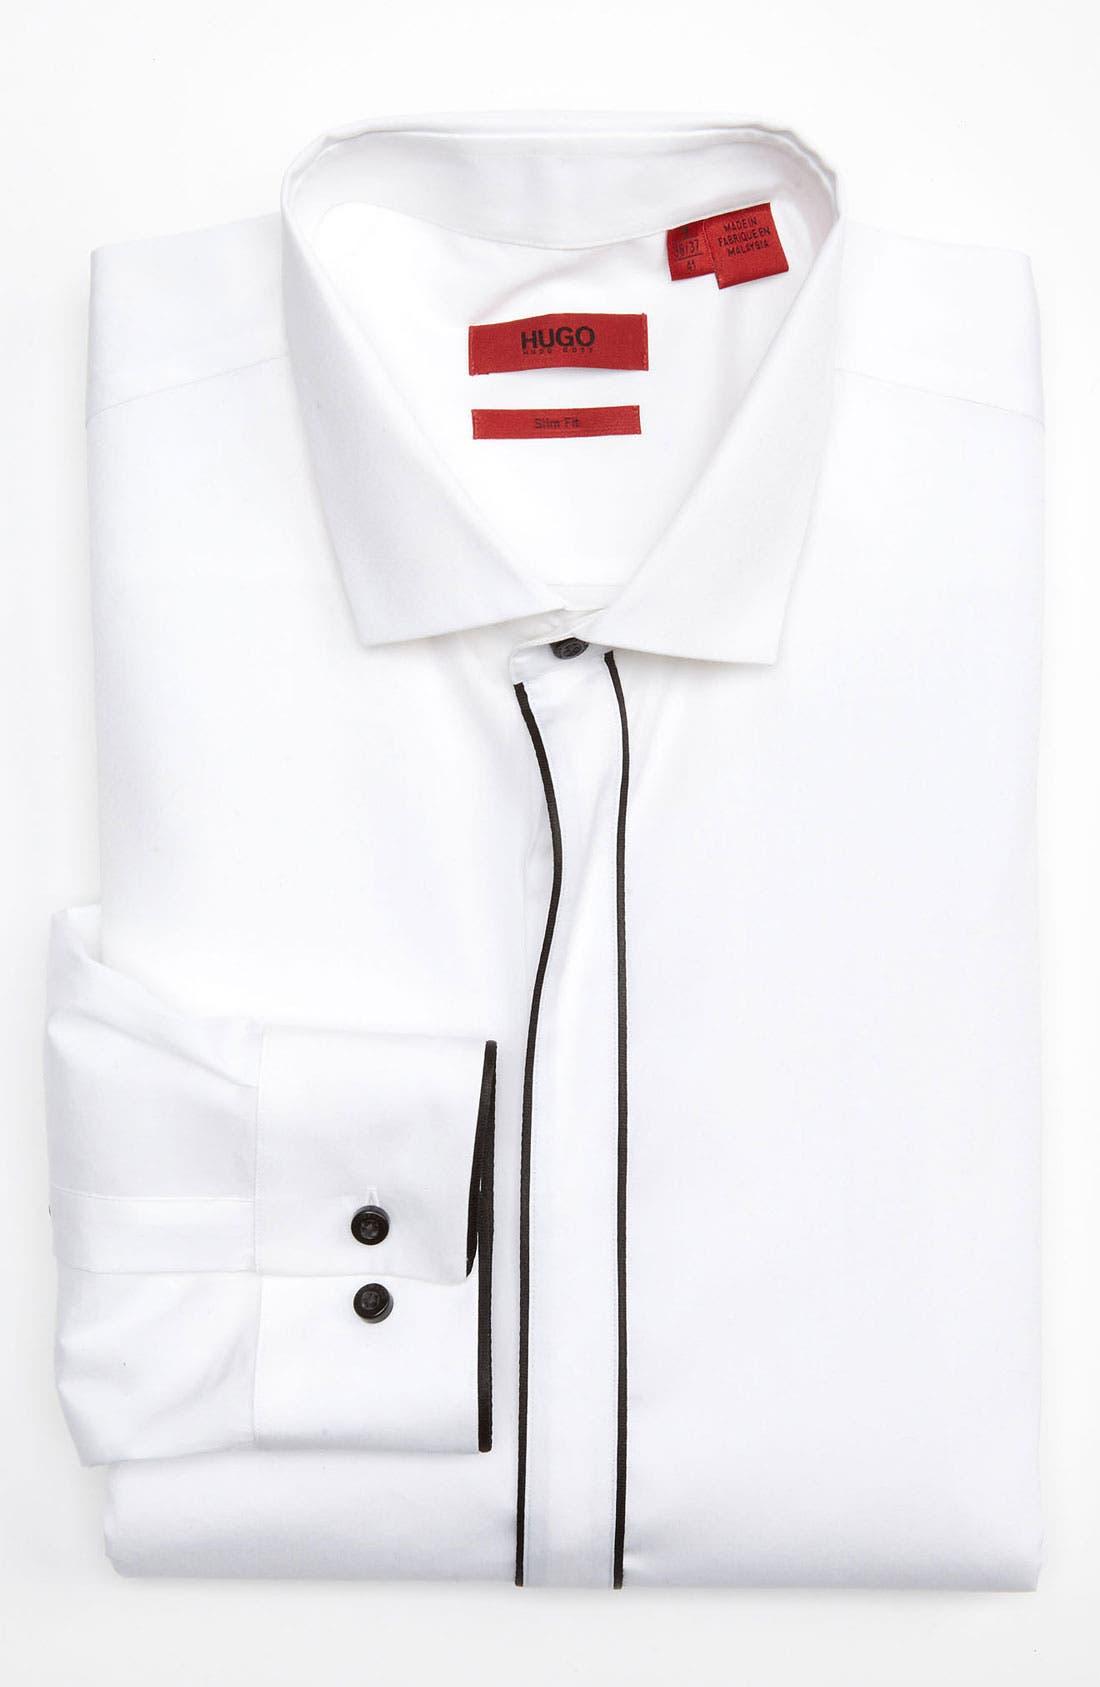 Alternate Image 1 Selected - HUGO 'Excitex' Slim Fit Tuxedo Shirt